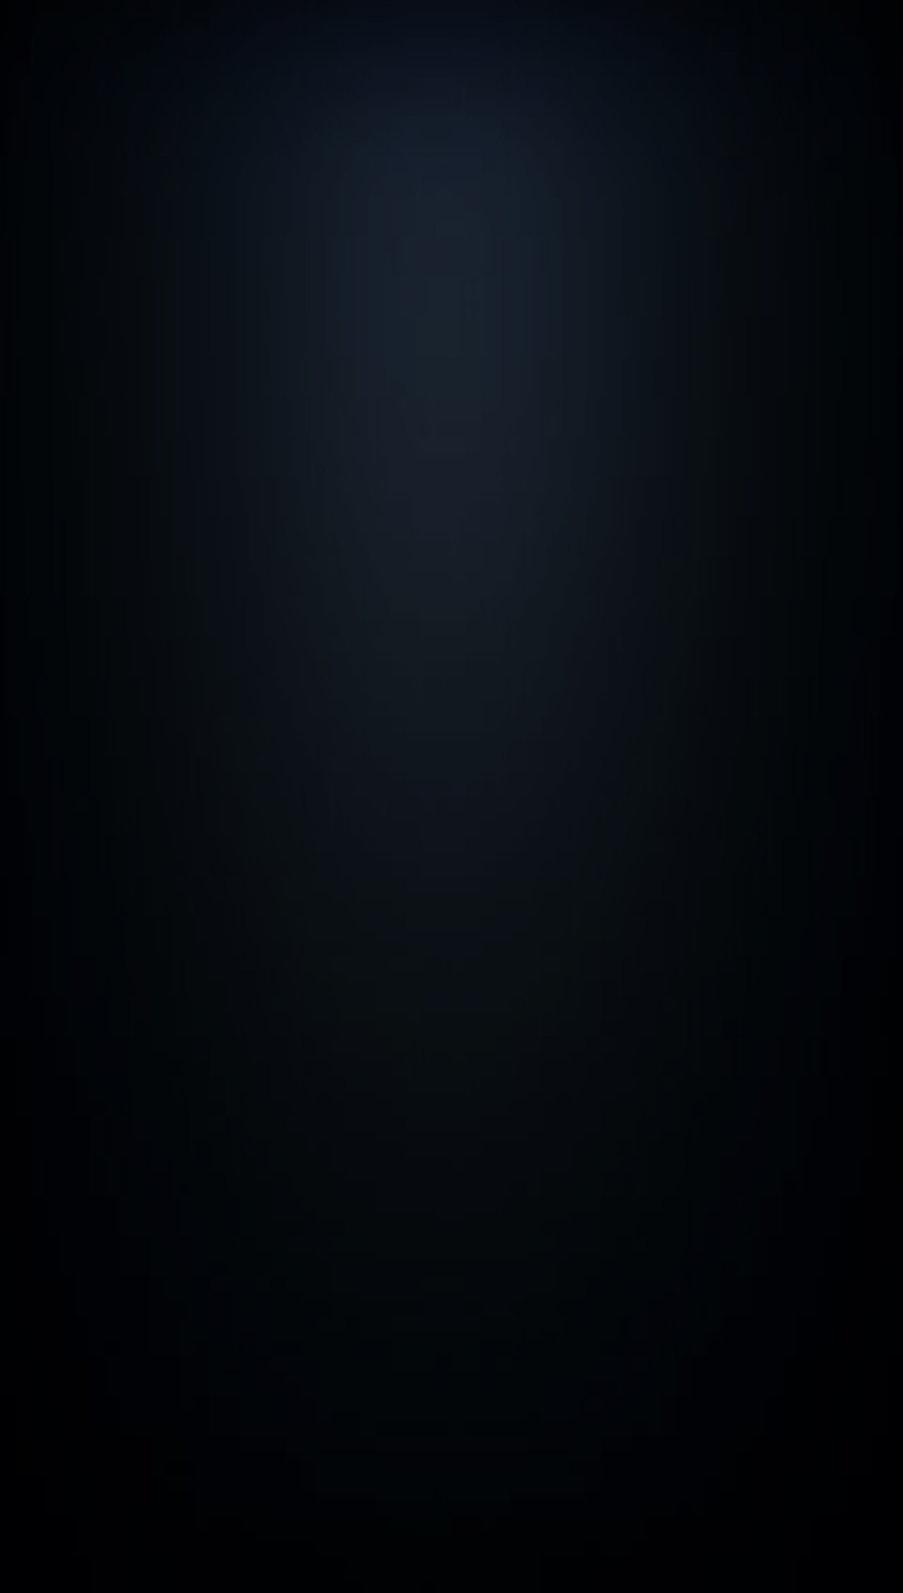 black curtain 6.jpg